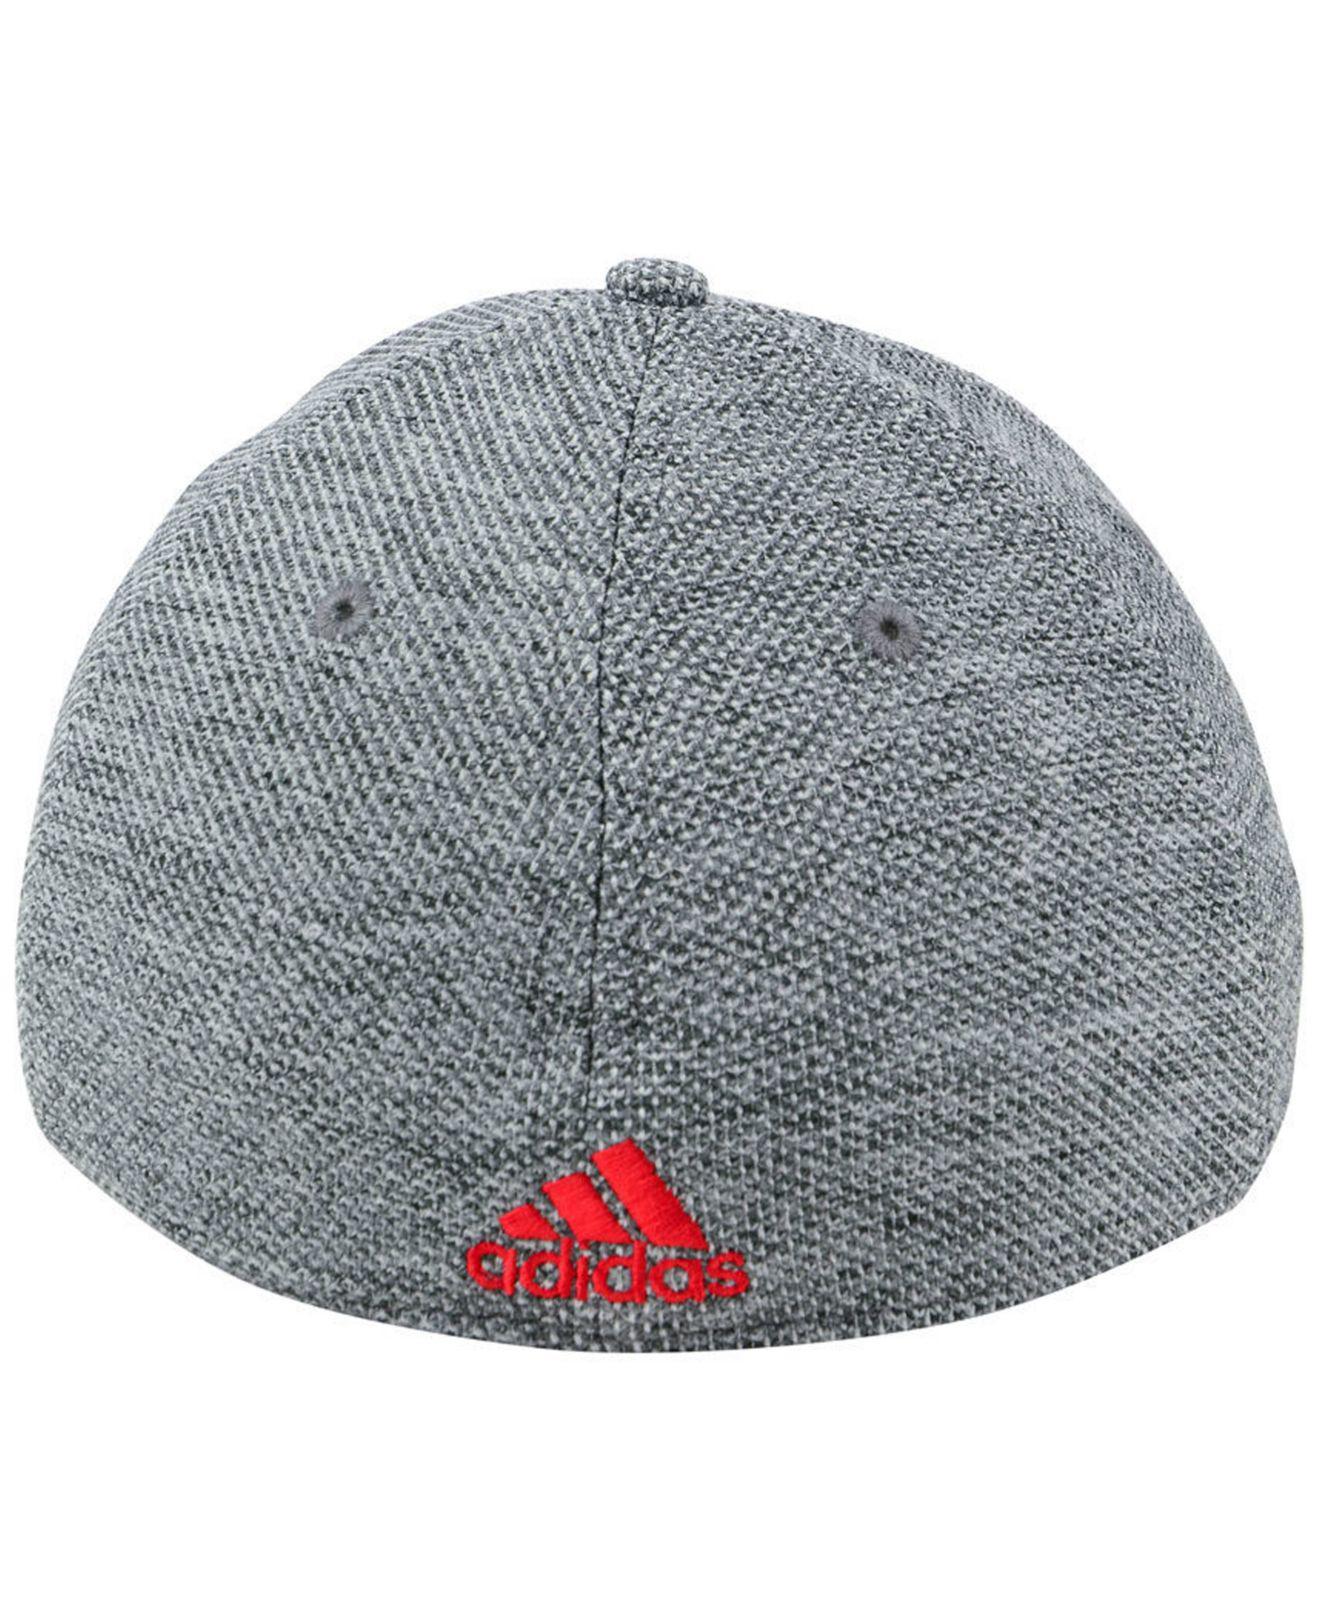 huge discount 50c11 4e51f new zealand fc dallas mens beanie a0f94 aaa12  cheapest lyst adidas fc  dallas penalty kick flex cap in gray for men 9caf2 3a36a